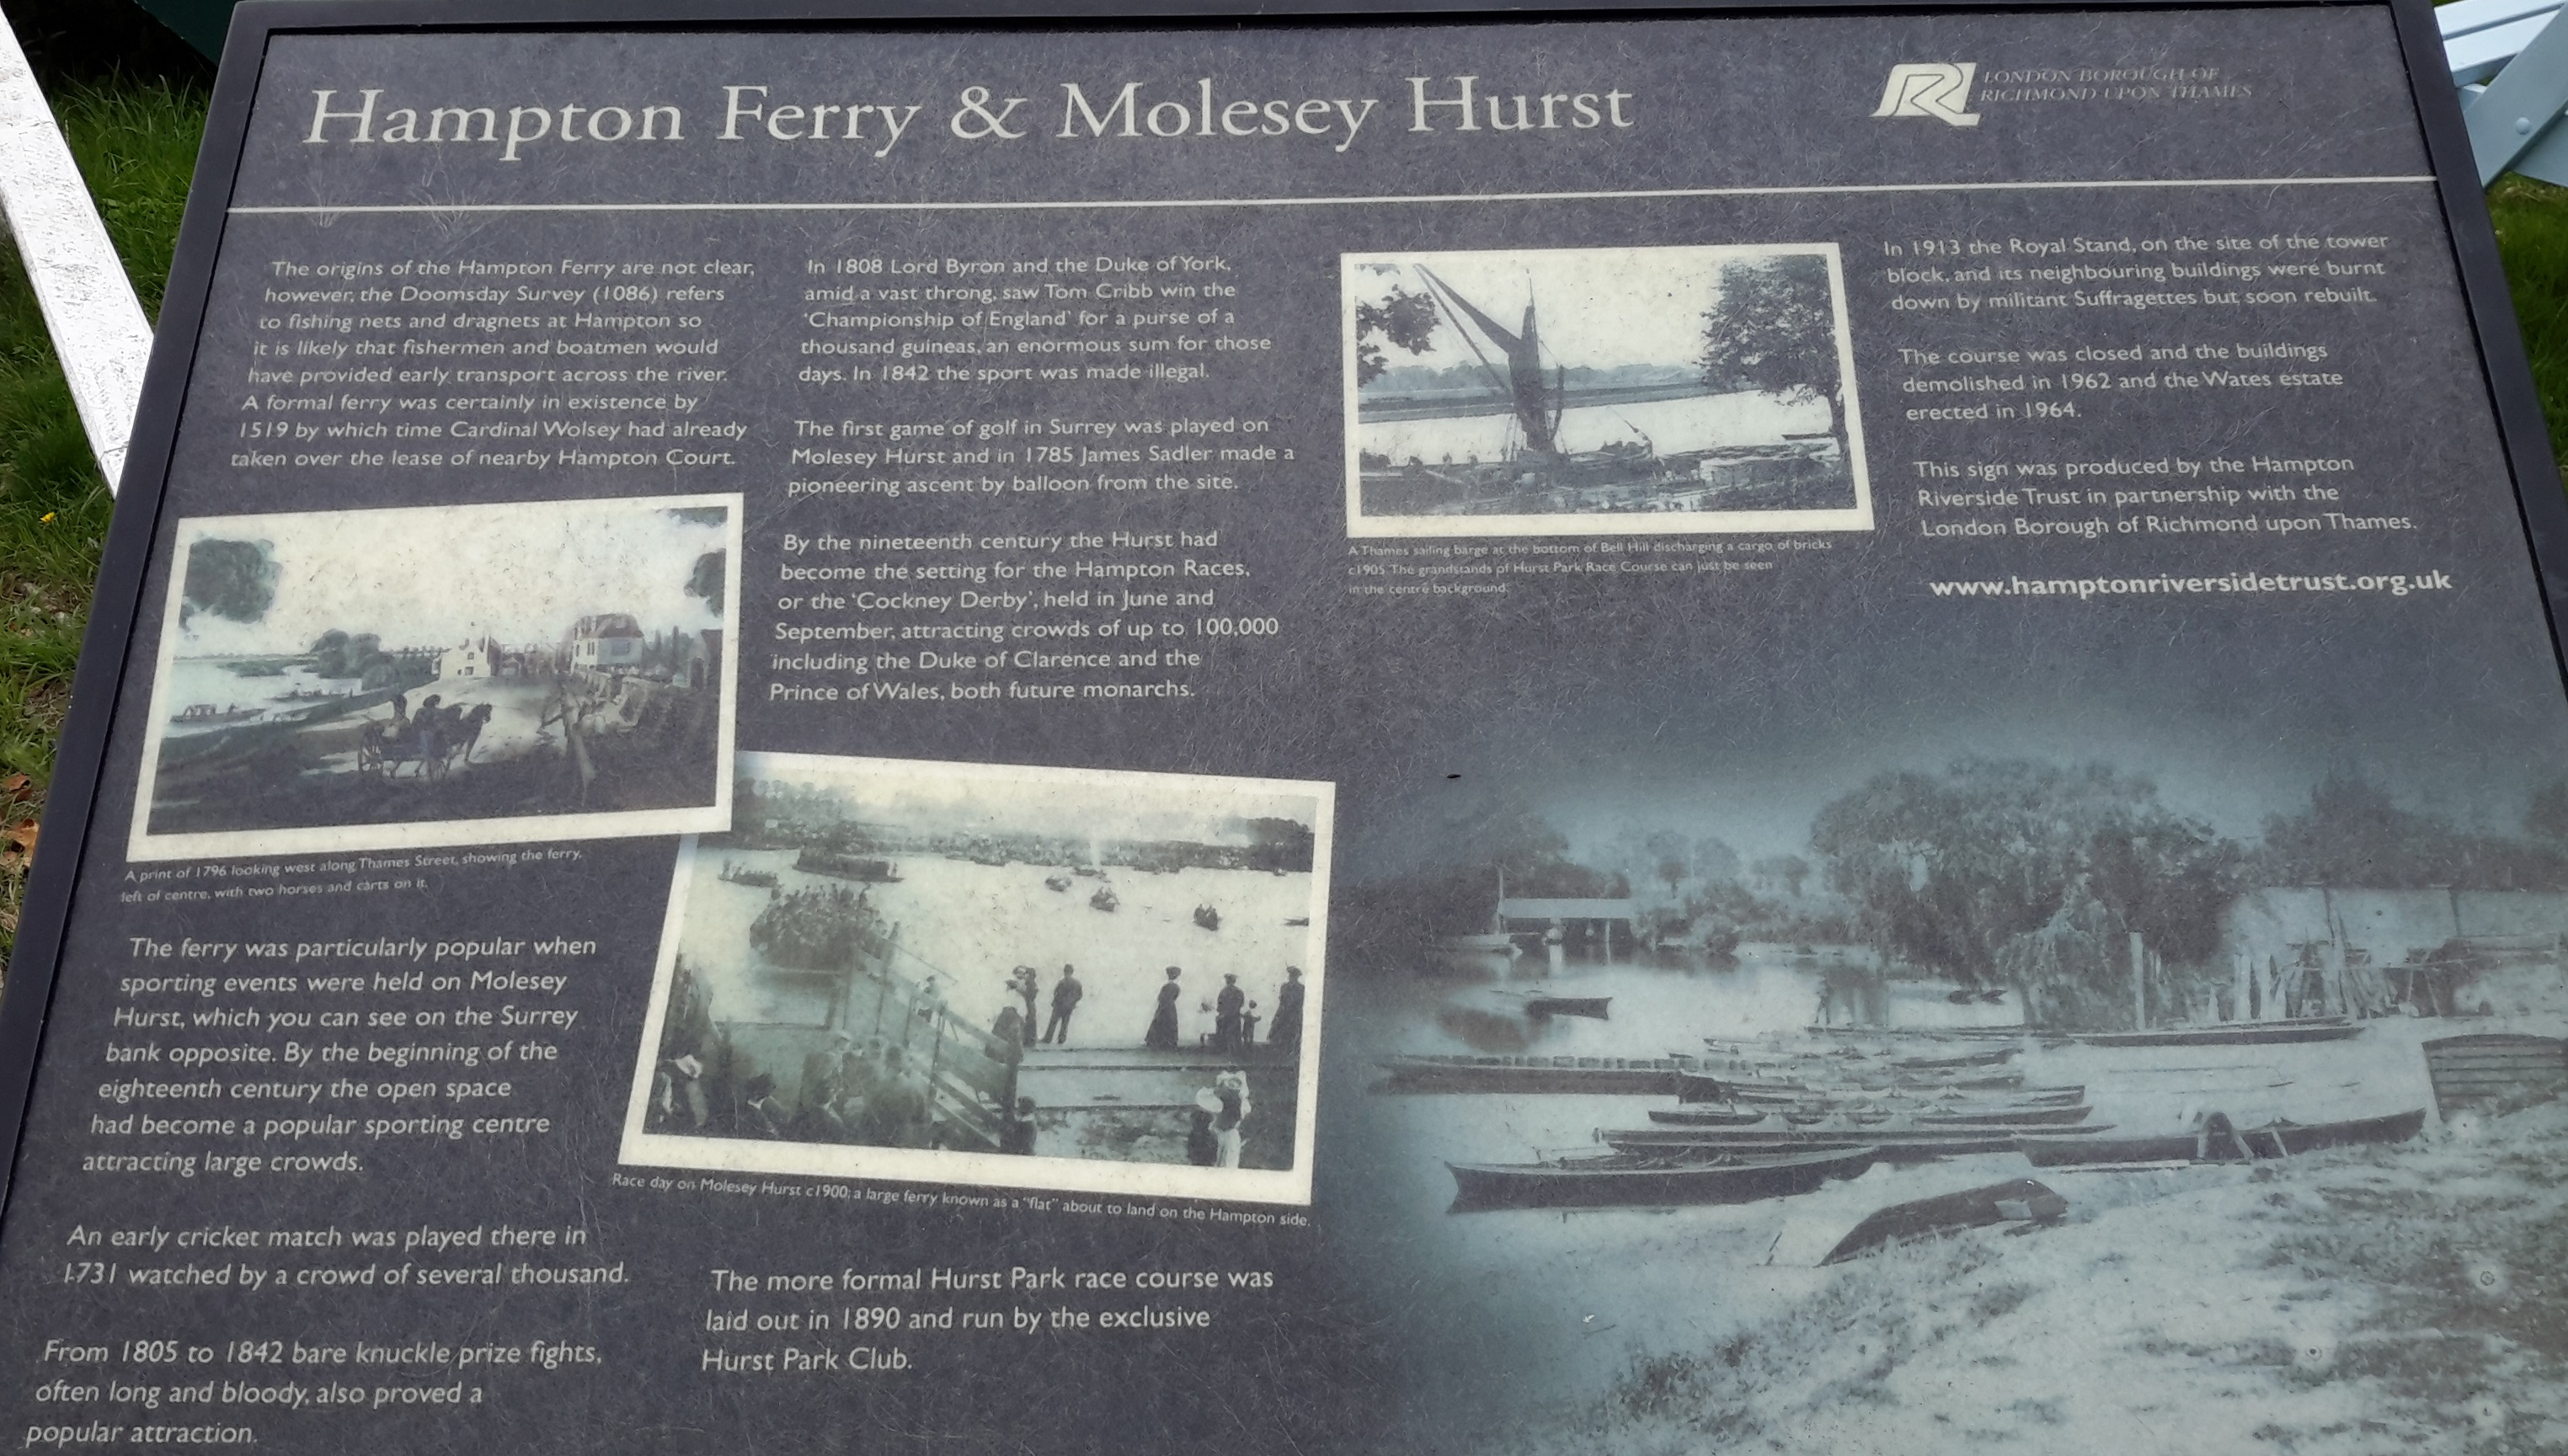 Hampton Ferry & Molesey Hurst